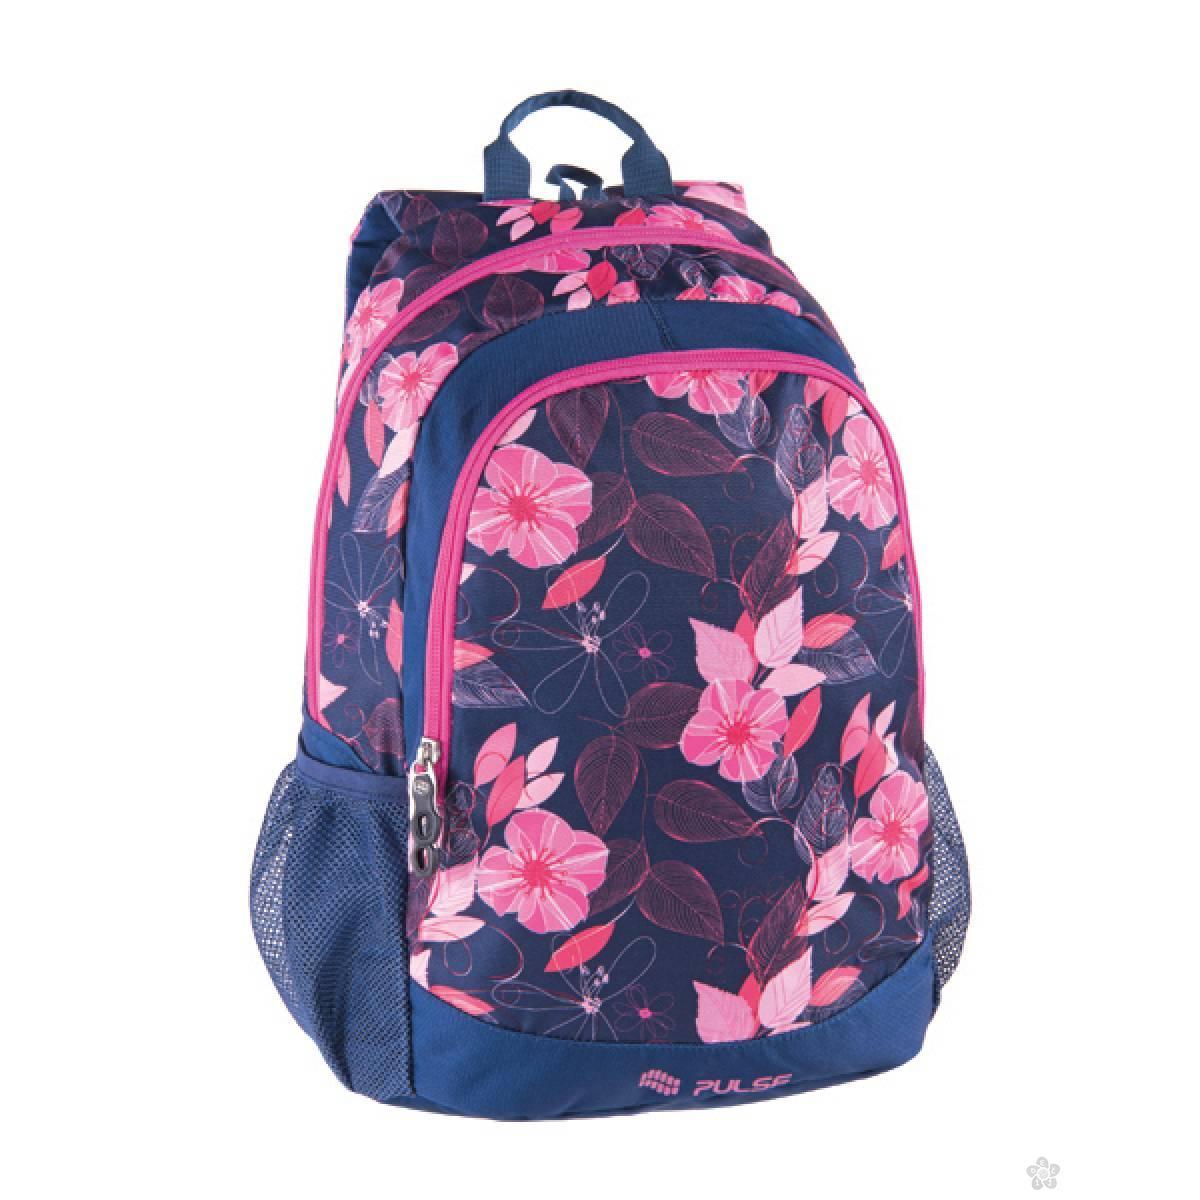 Ranac Cots Pink Garden 121618